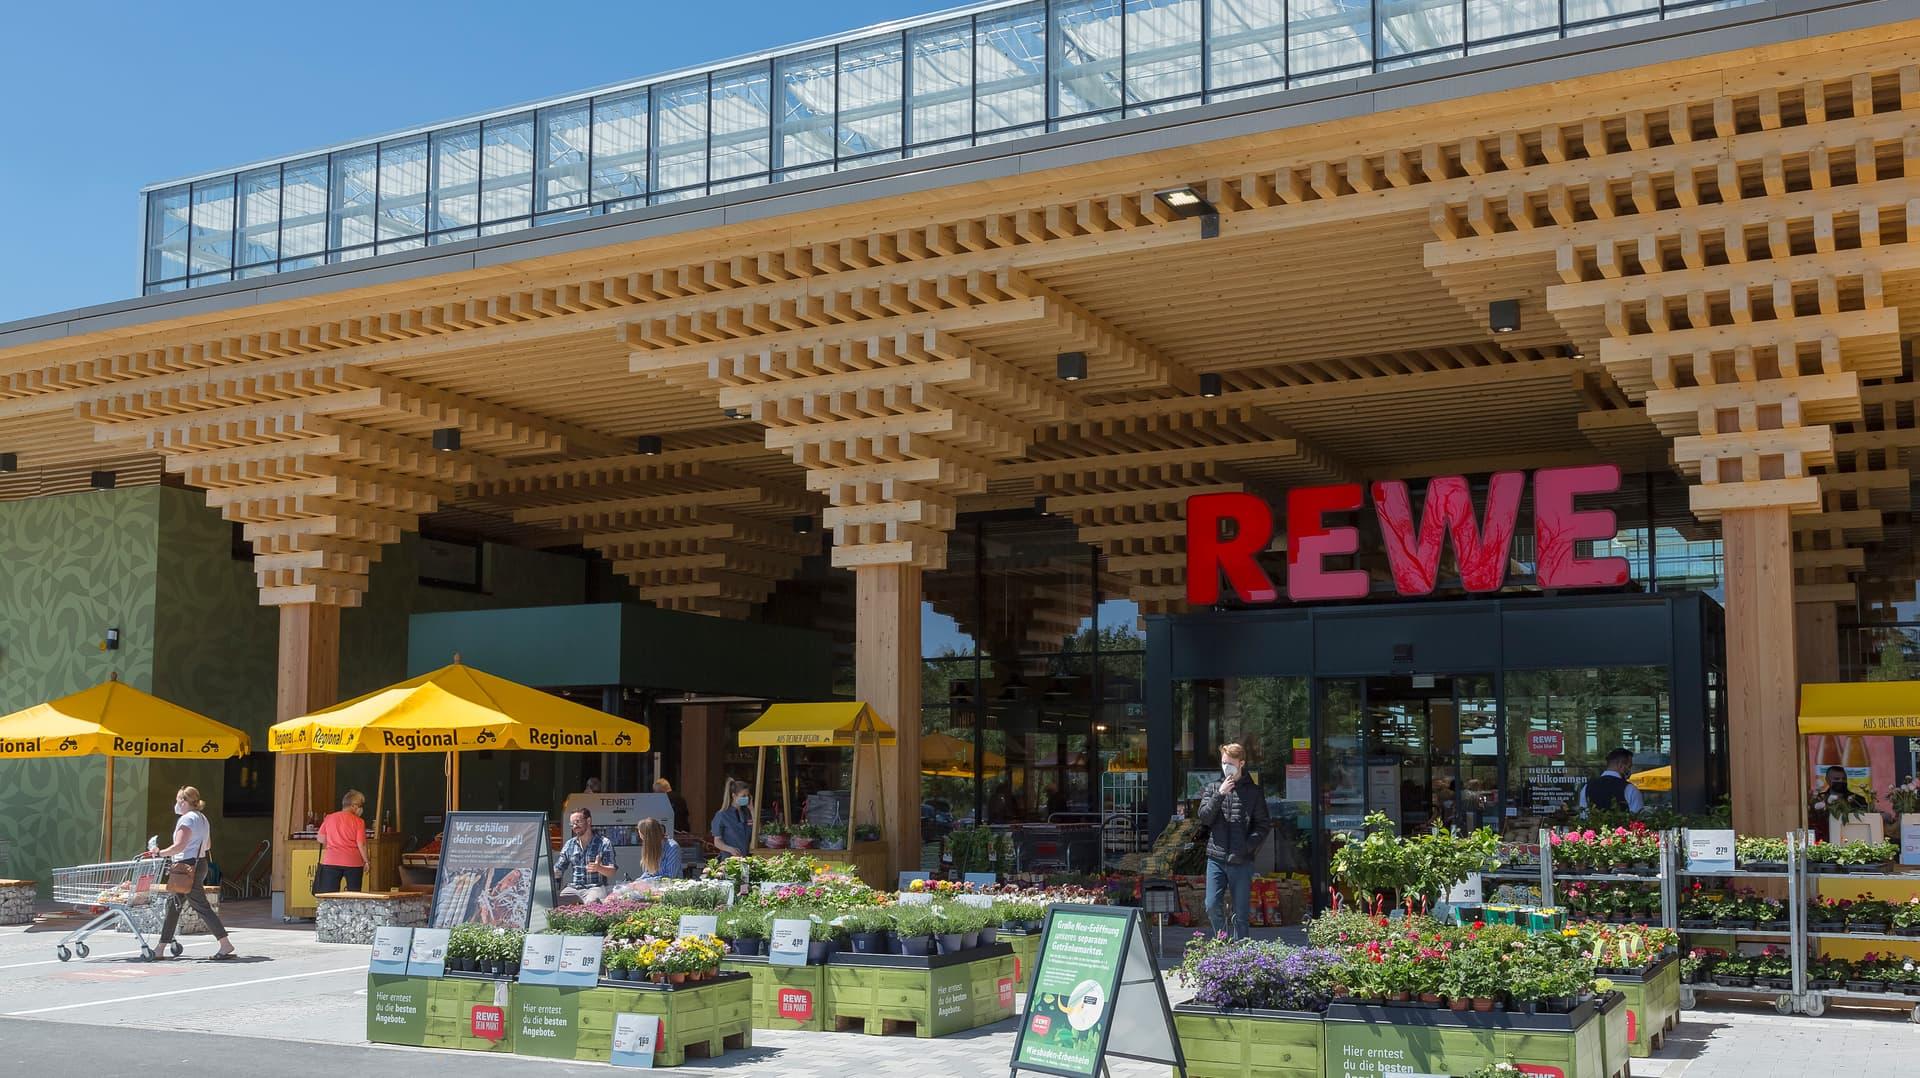 Rewe Green Farming Market